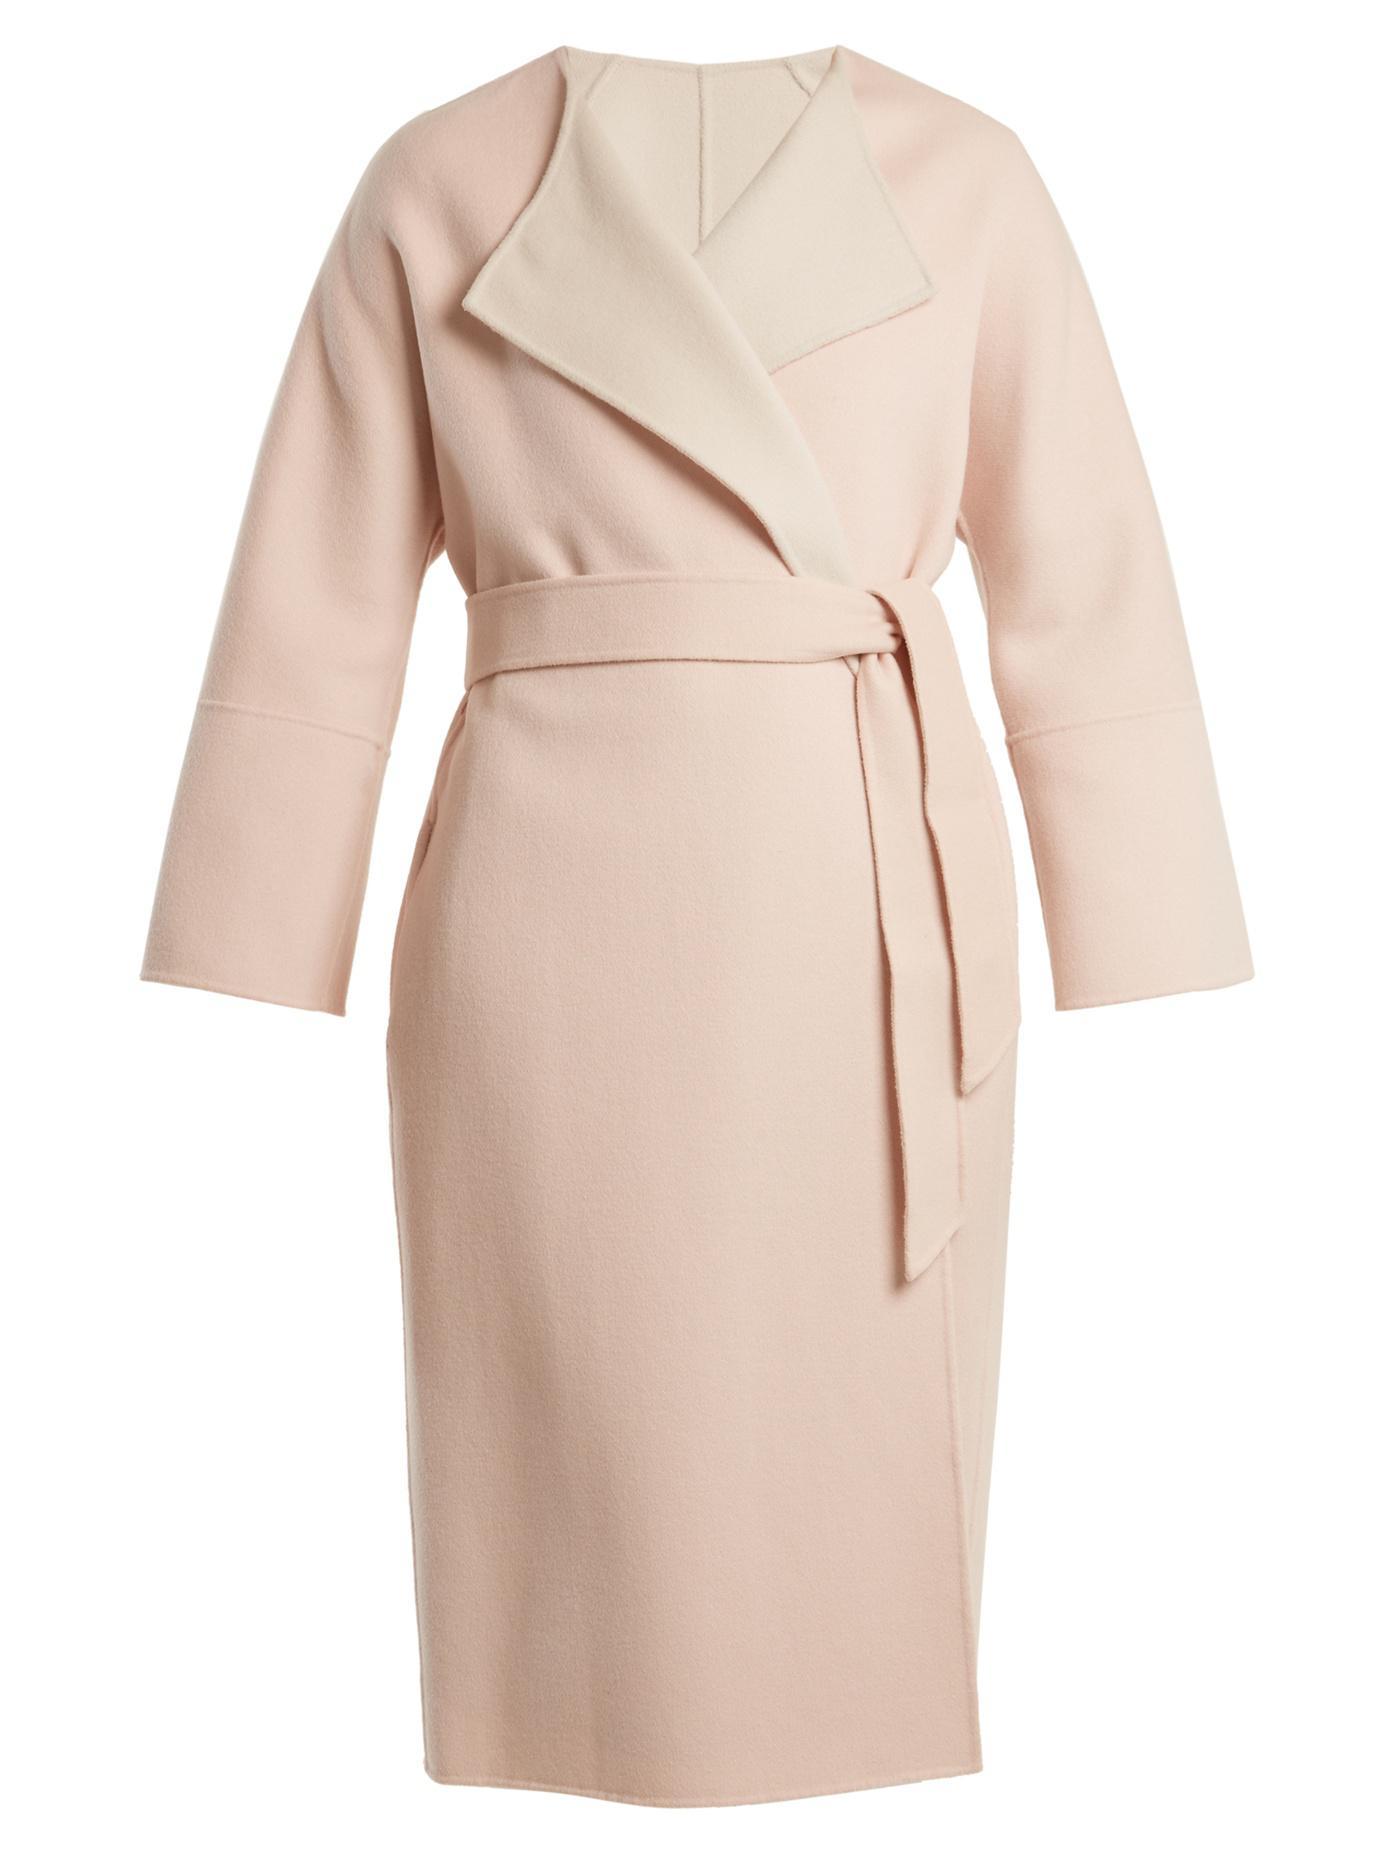 lyst weekend by maxmara lari coat in pink. Black Bedroom Furniture Sets. Home Design Ideas